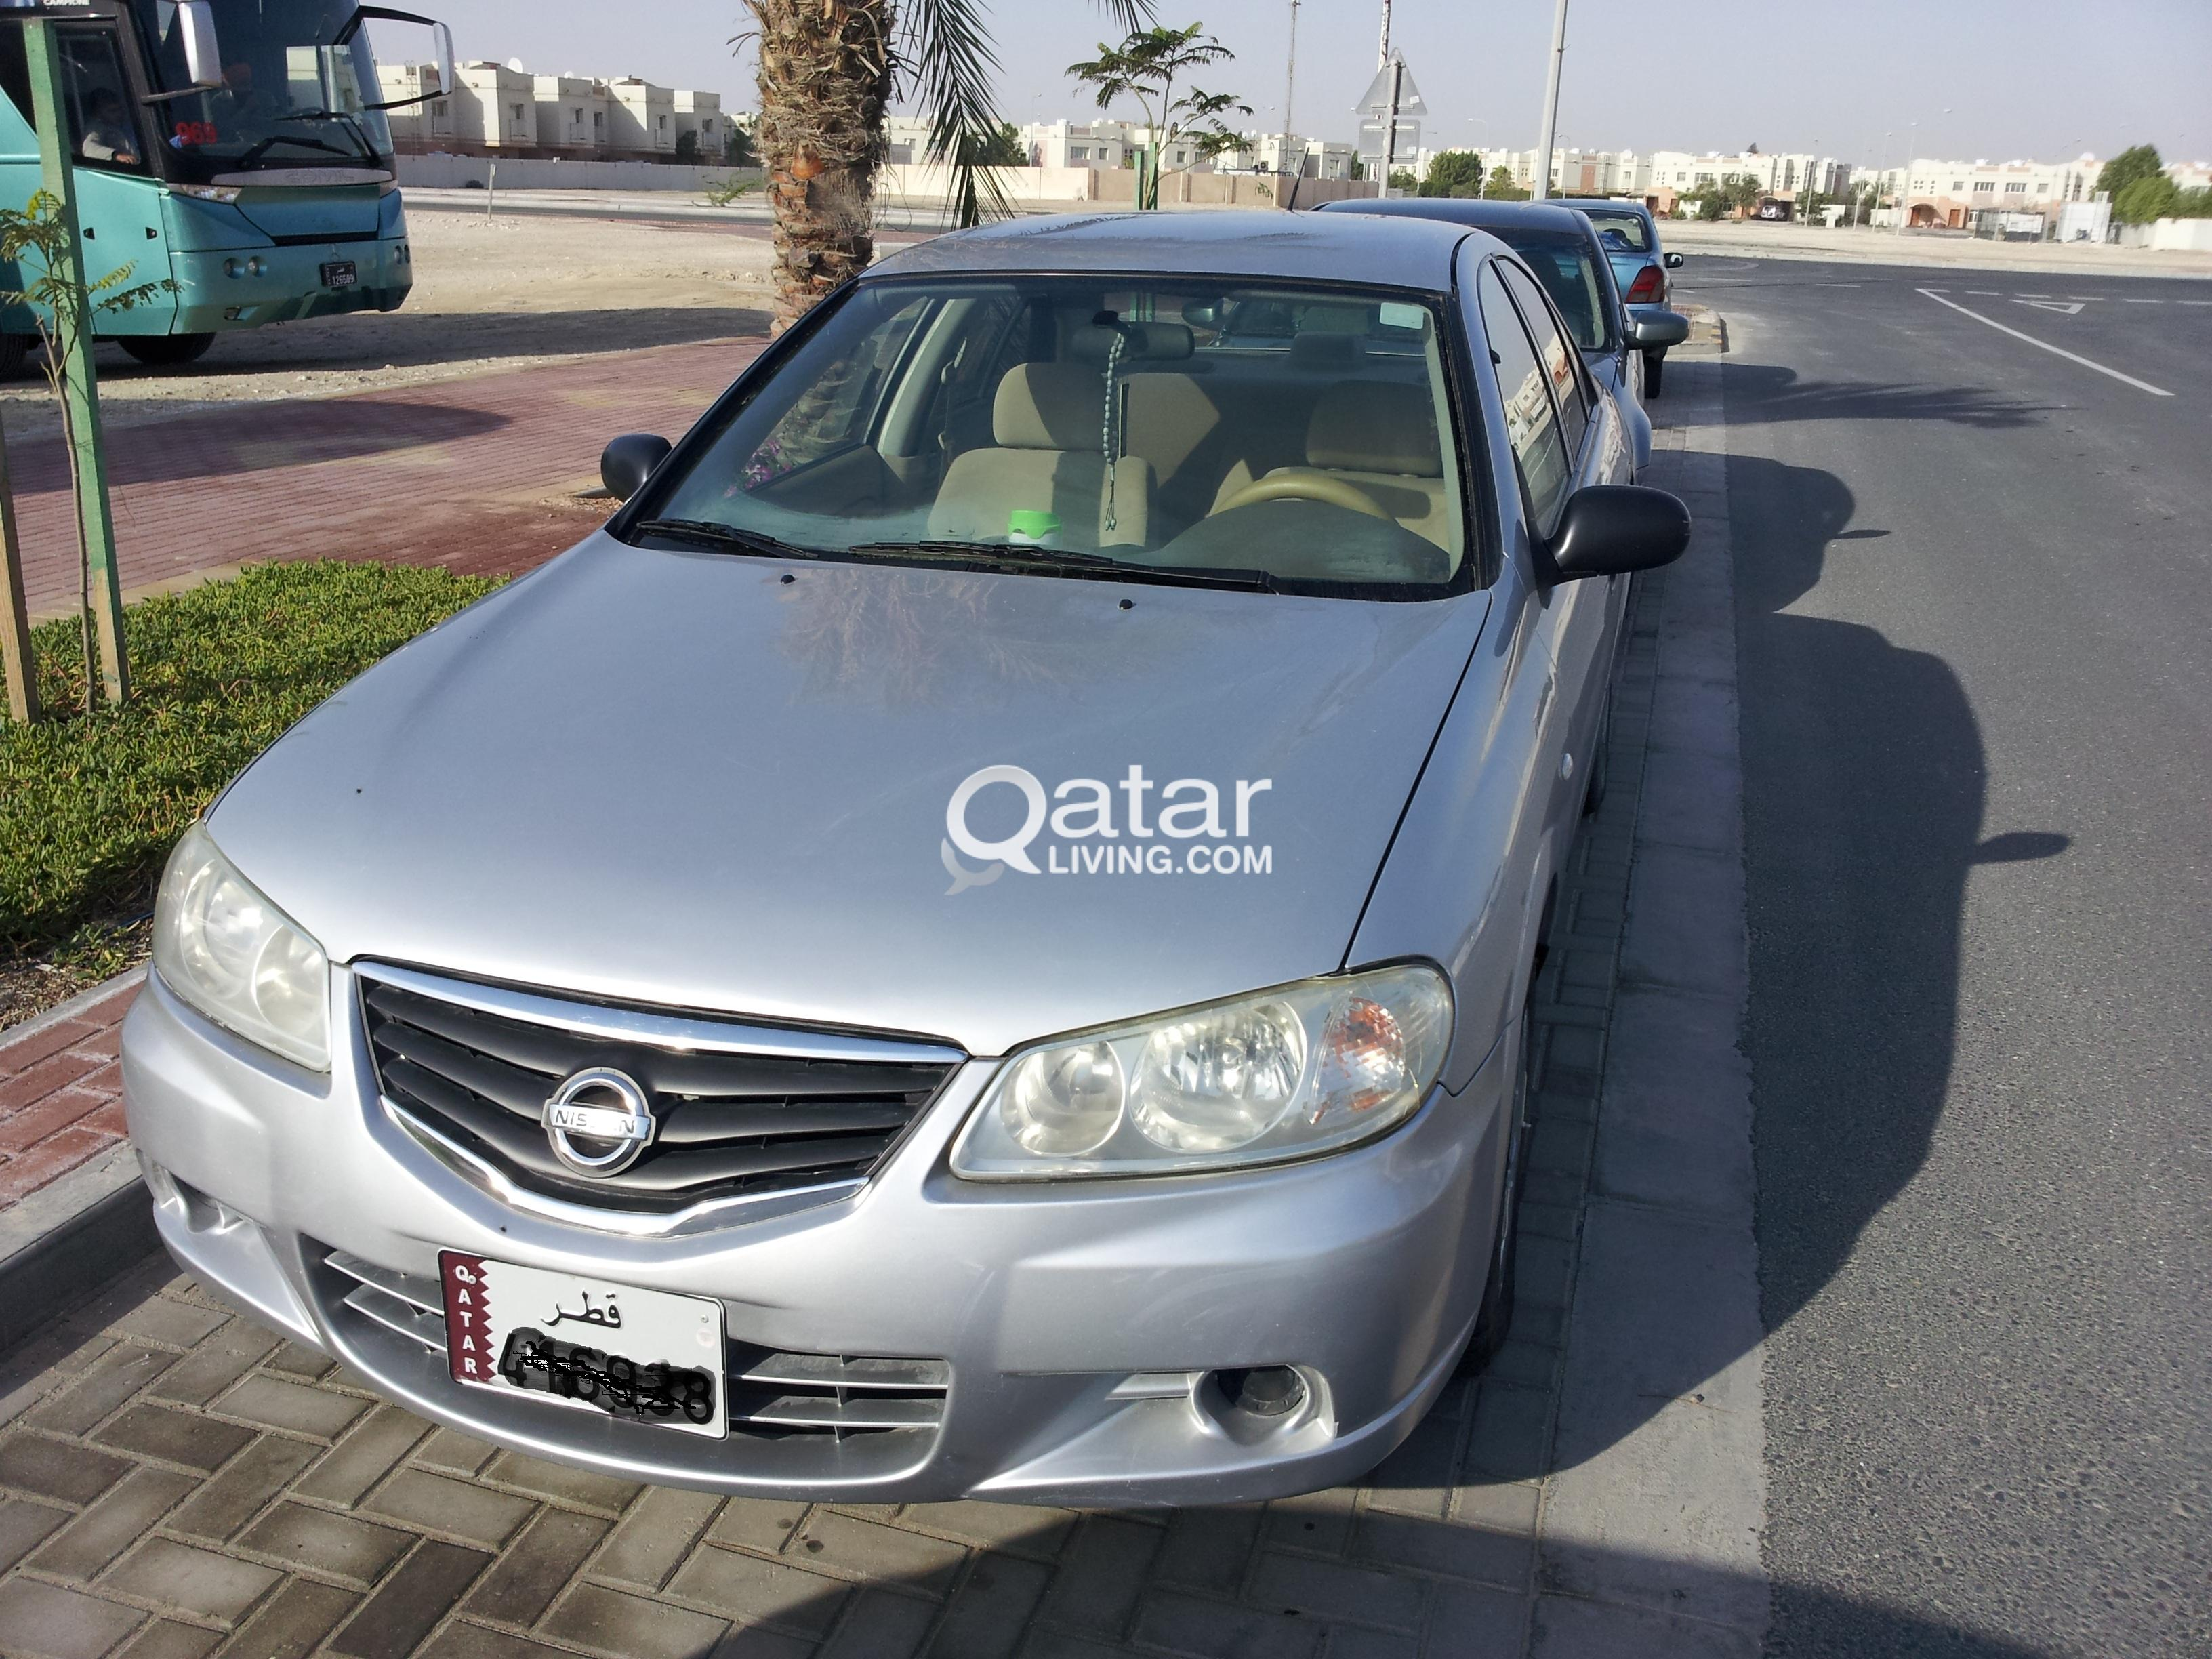 Nissan Sunny 2010 Japan Made For Sale Qatar Living